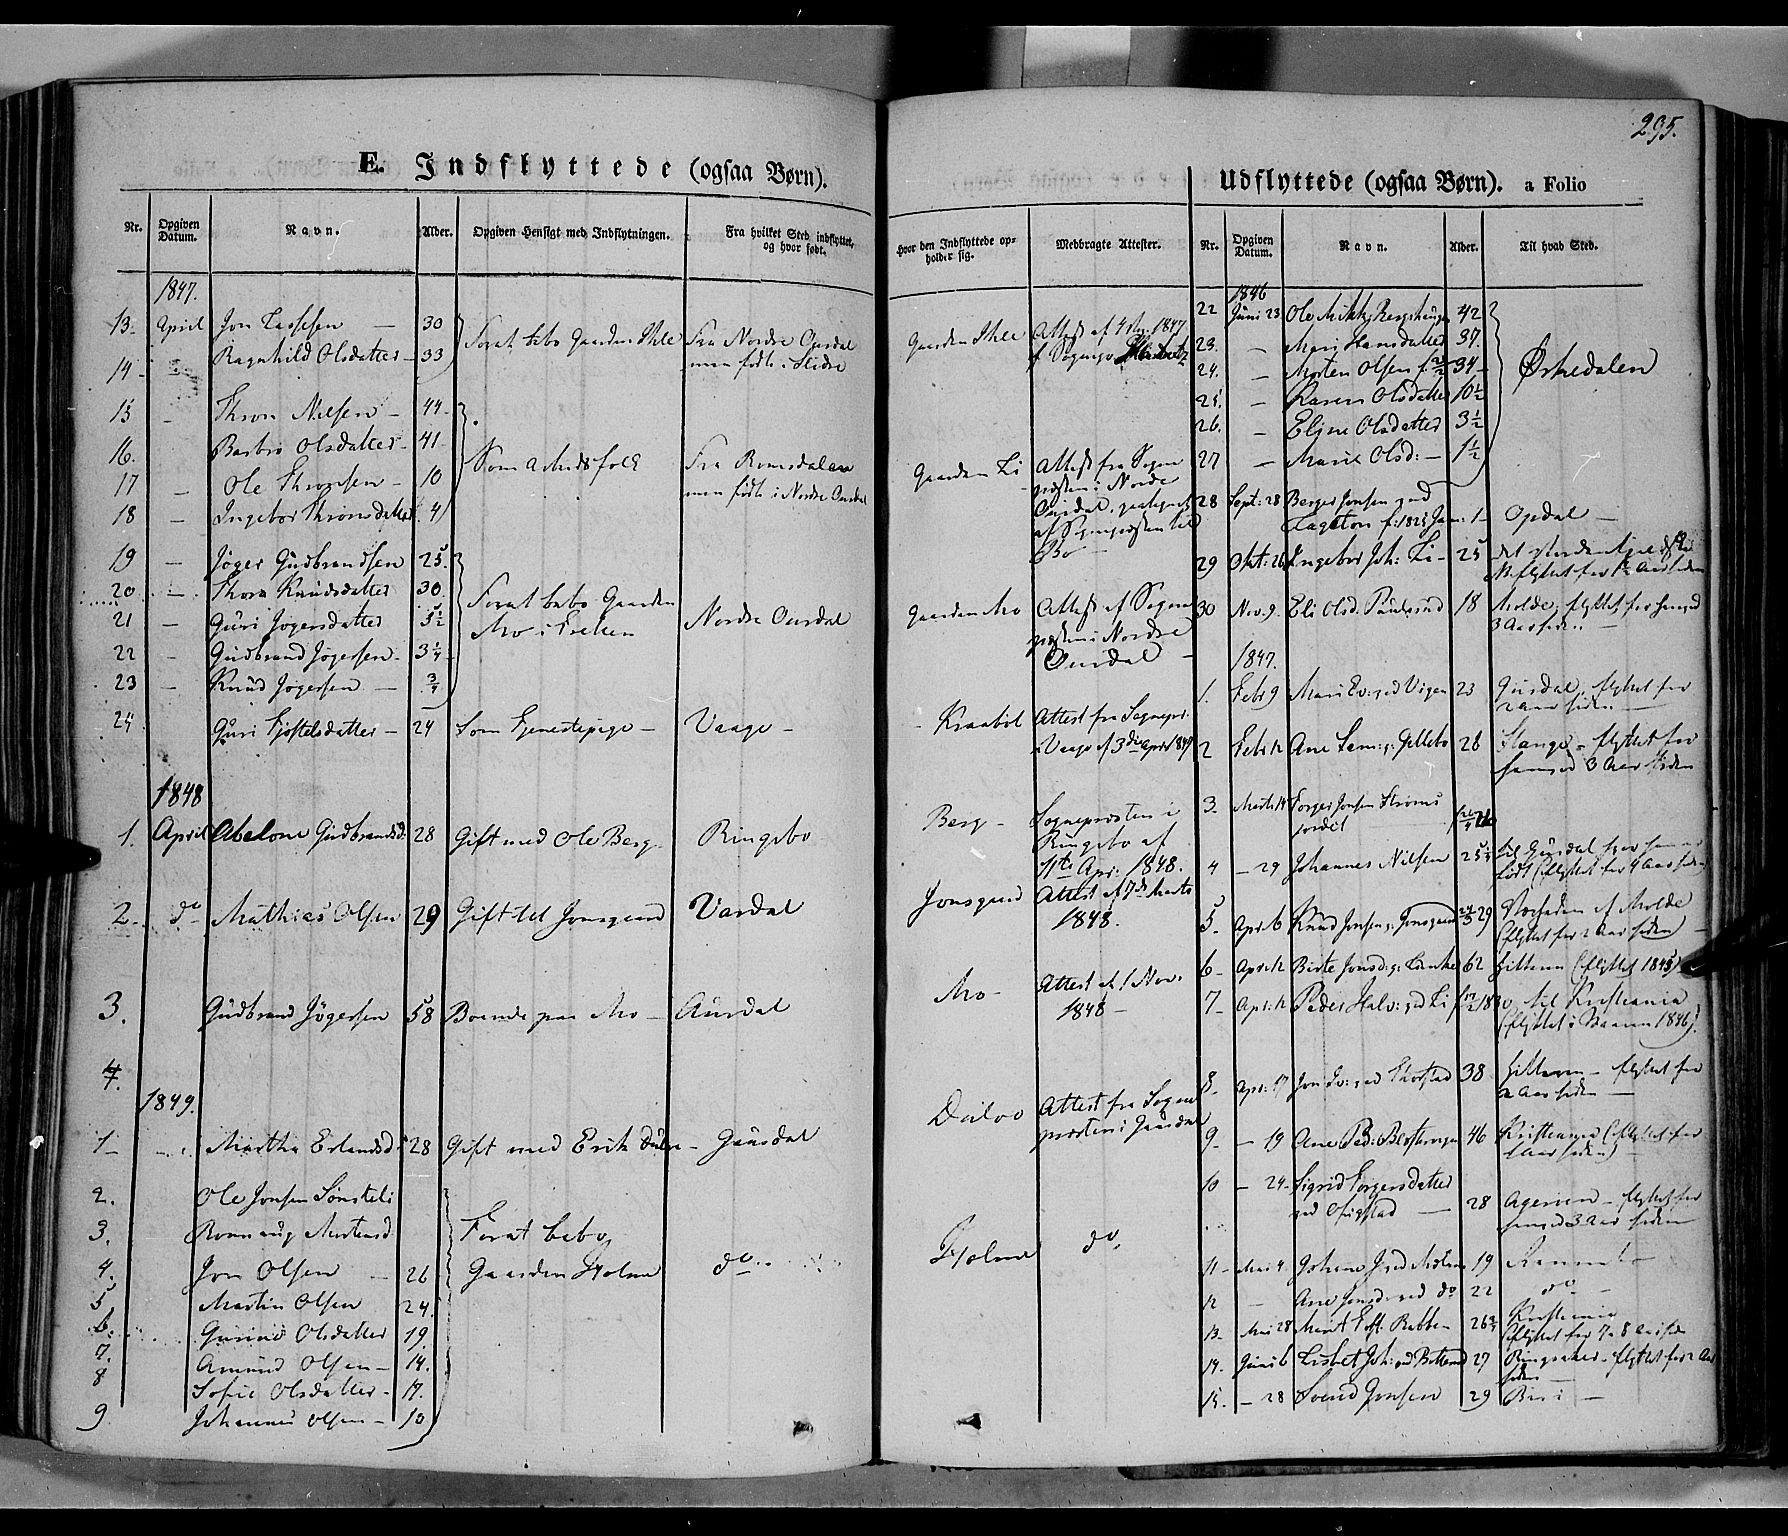 SAH, Øyer prestekontor, Ministerialbok nr. 5, 1842-1857, s. 295